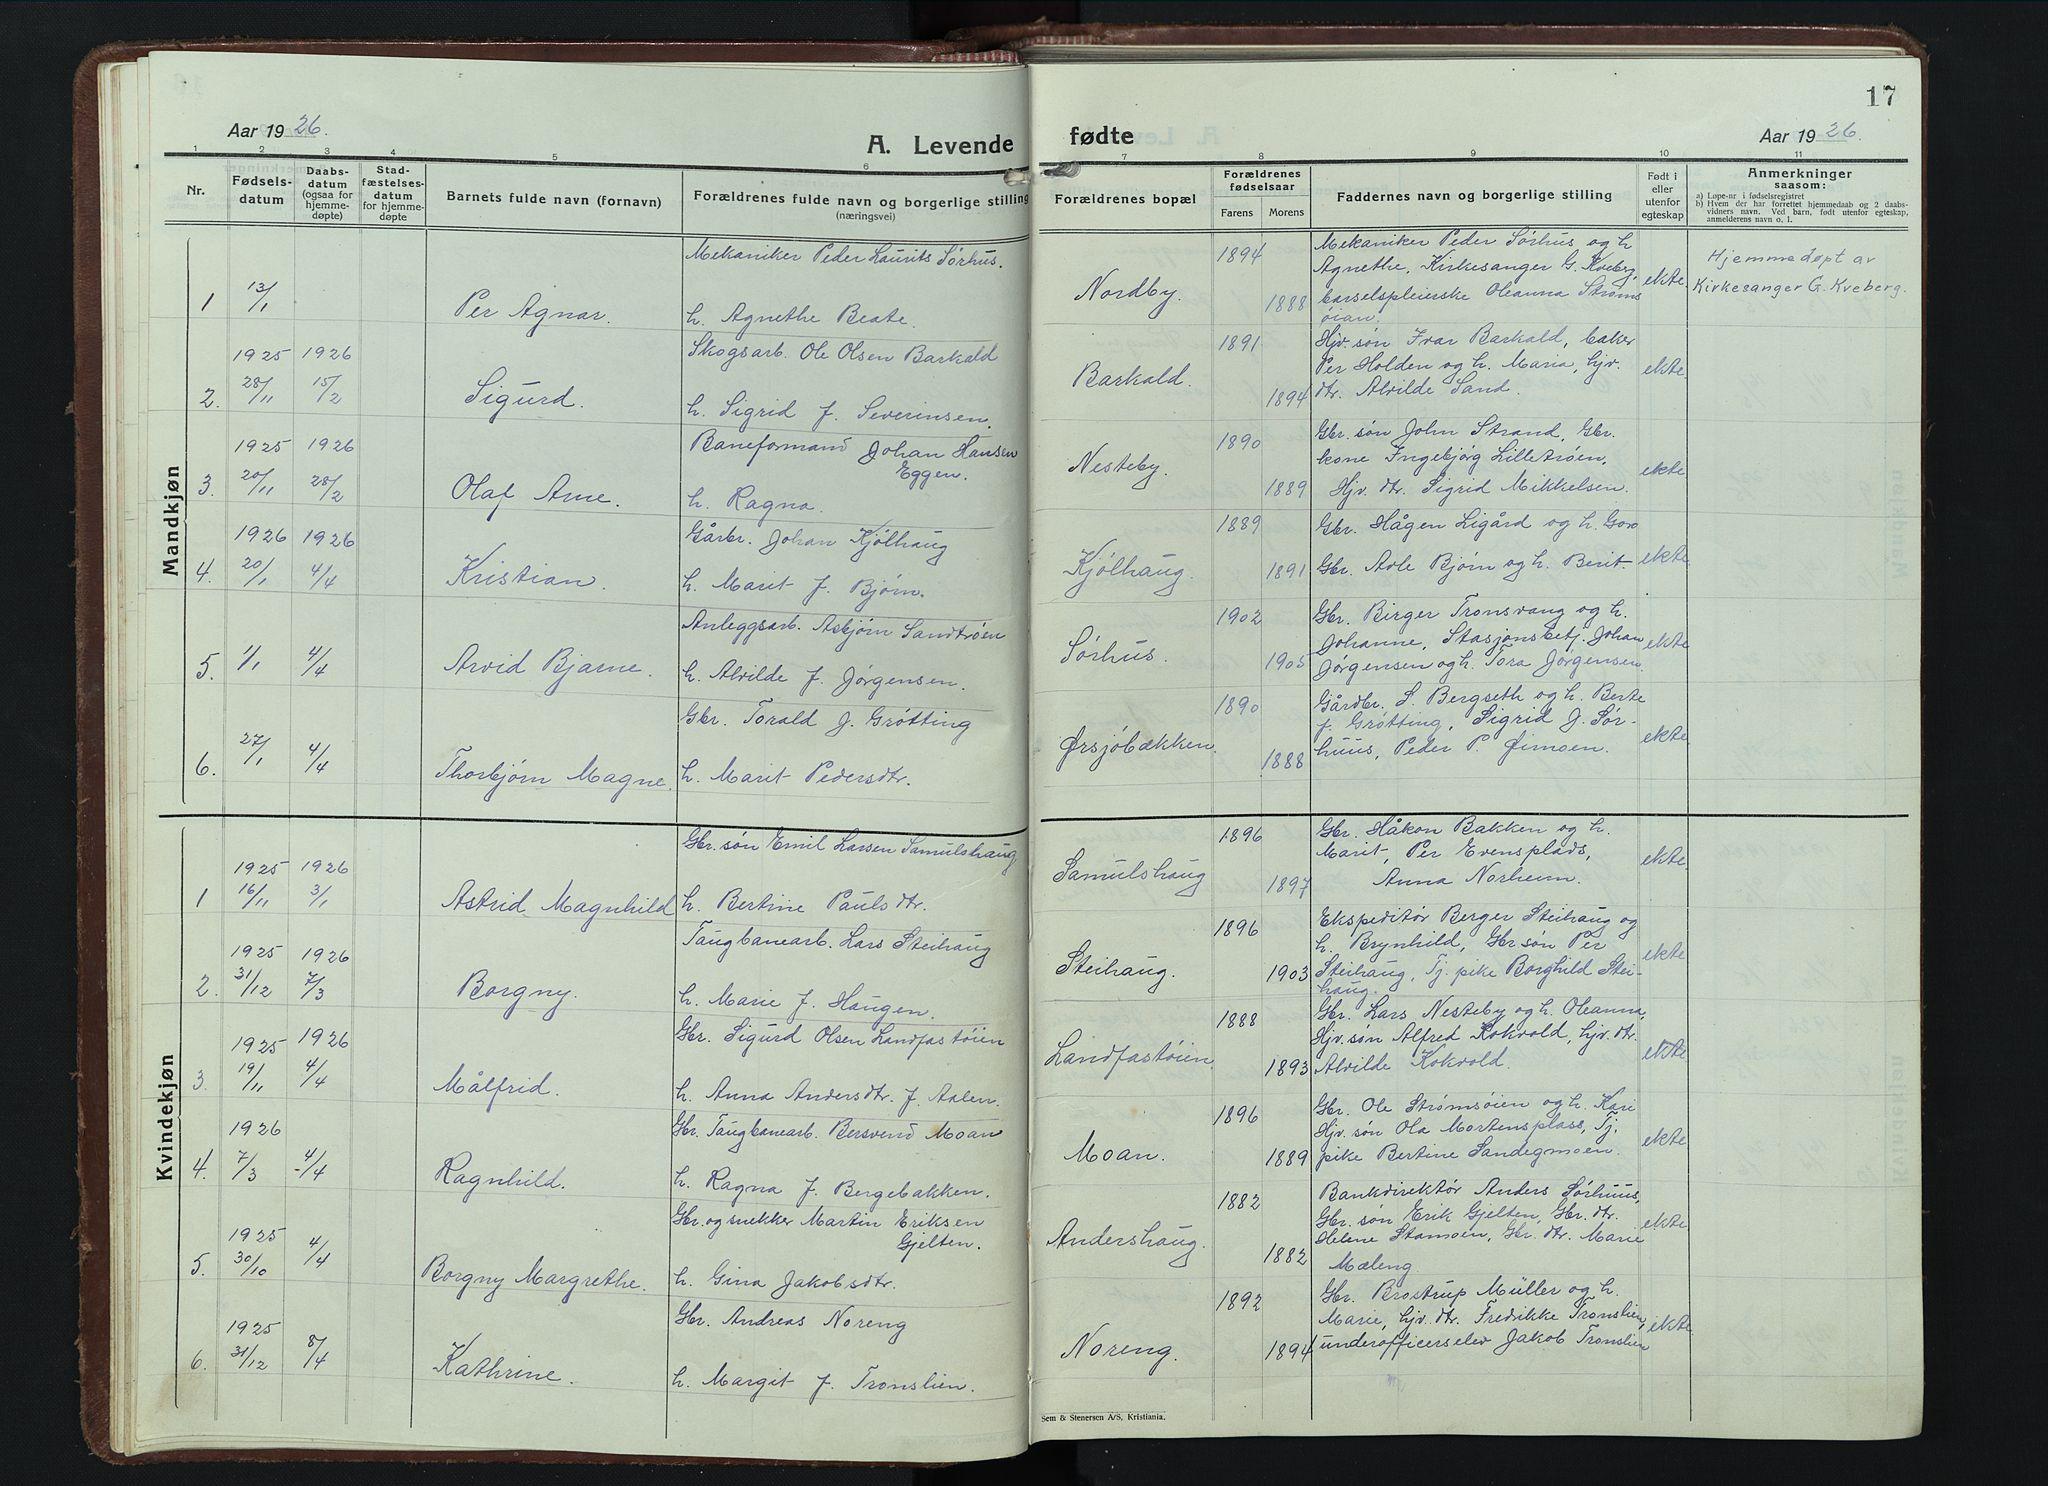 SAH, Alvdal prestekontor, Klokkerbok nr. 7, 1924-1945, s. 17